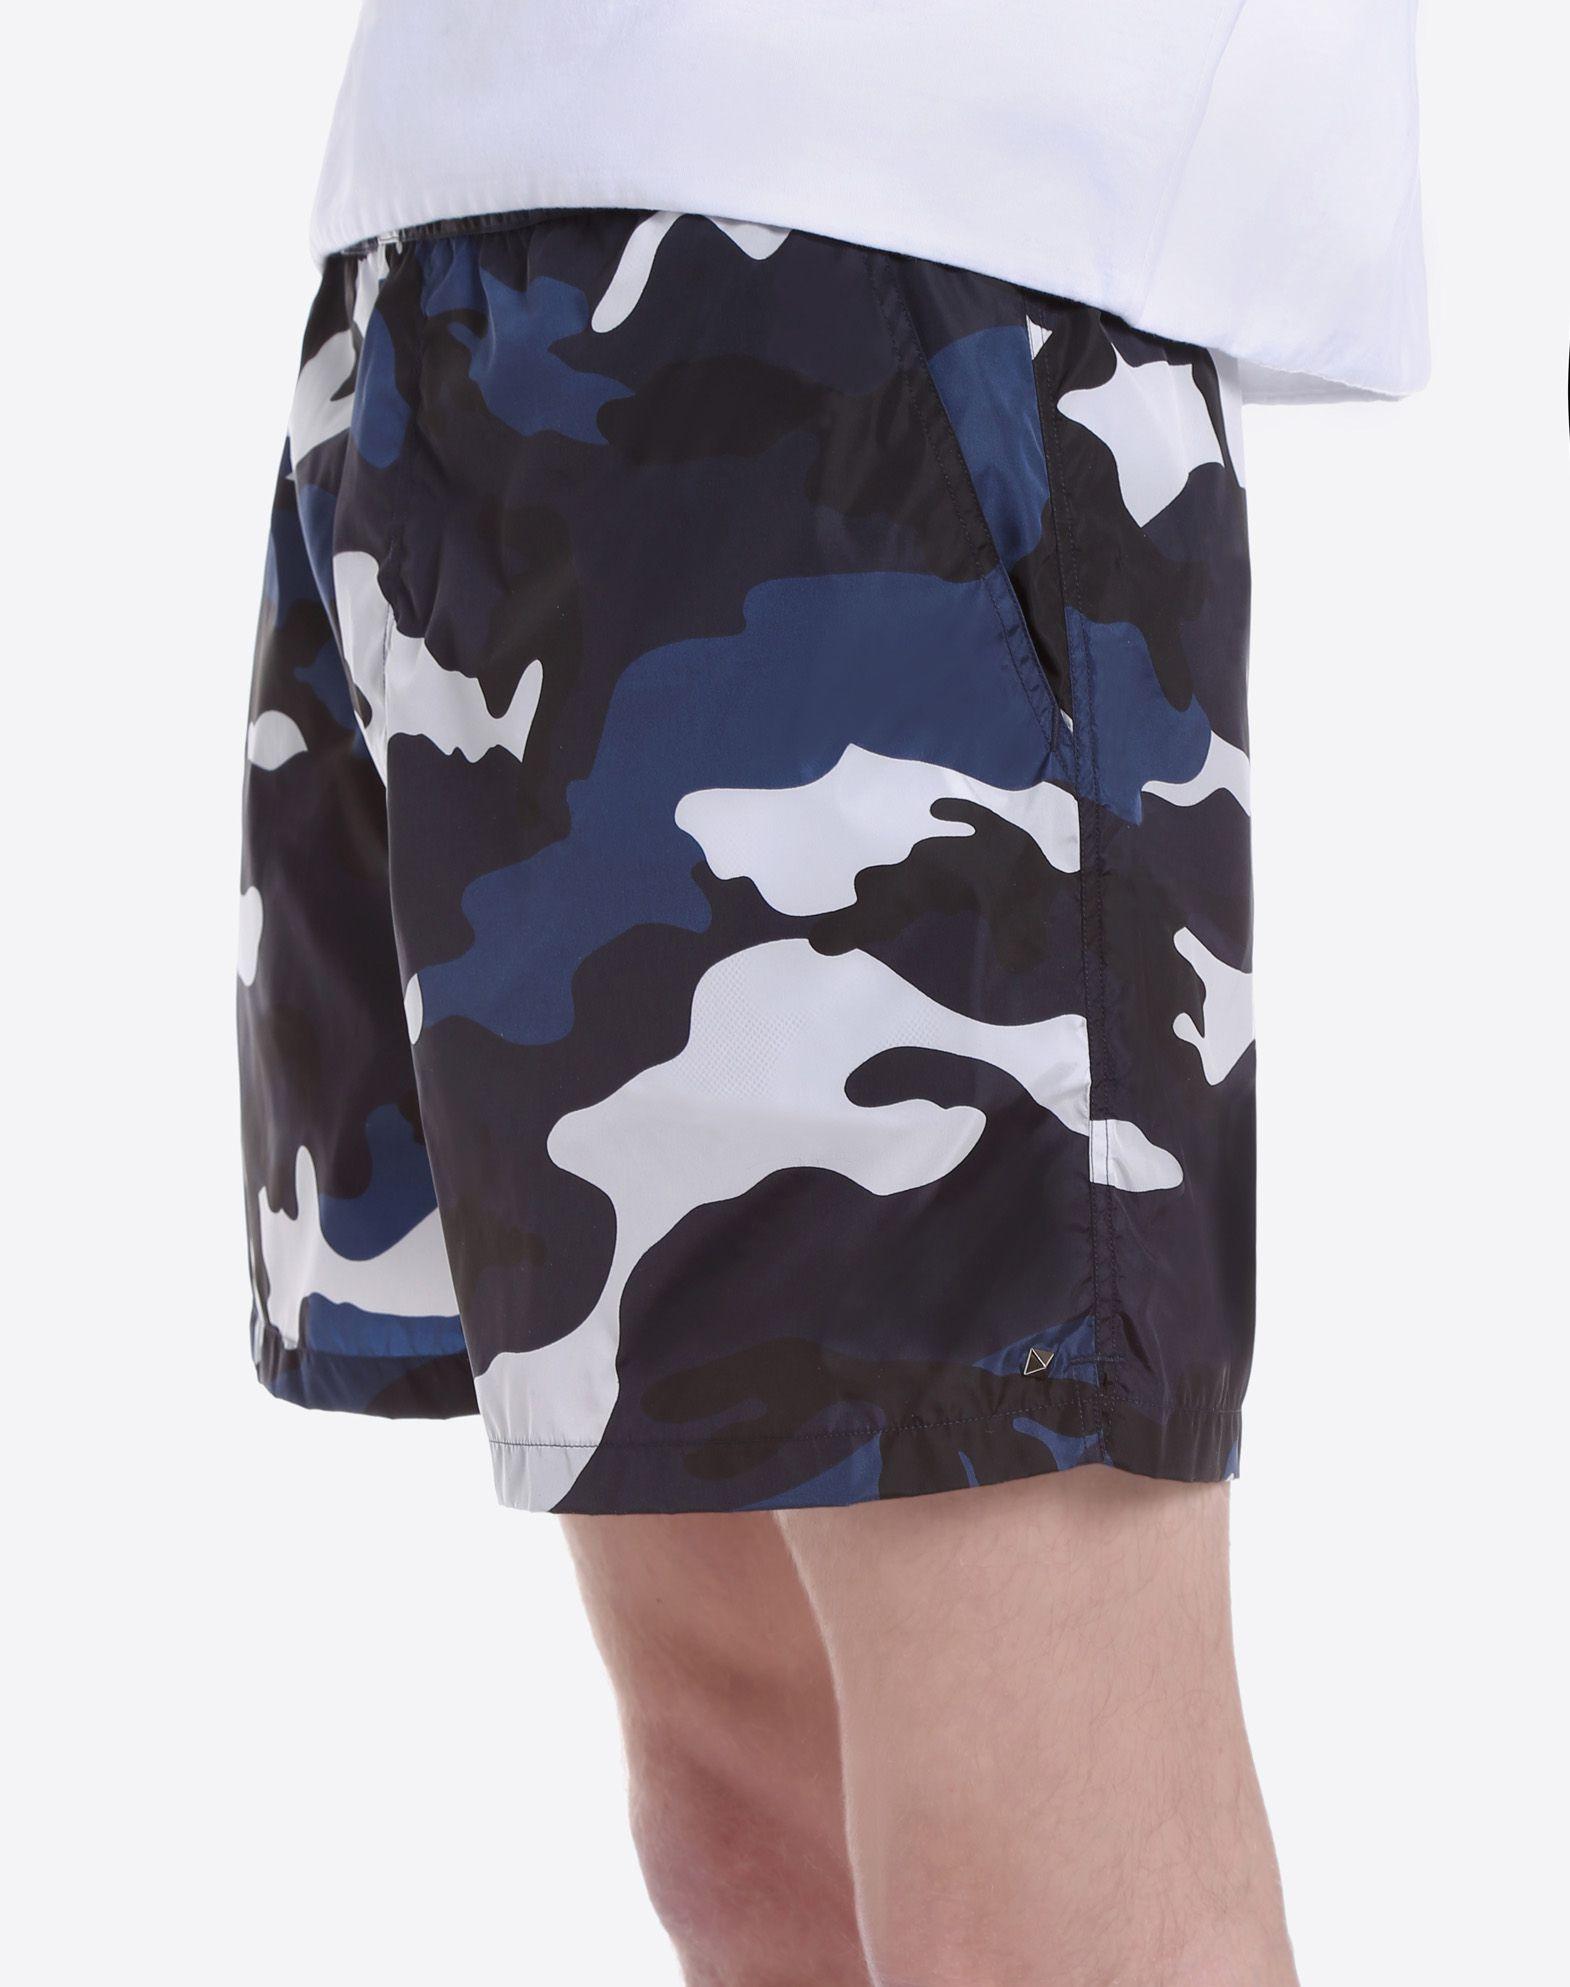 VALENTINO Techno fabric Snap-buttons, zip Internal slip Mid Rise Three pockets Studs  47201418vd